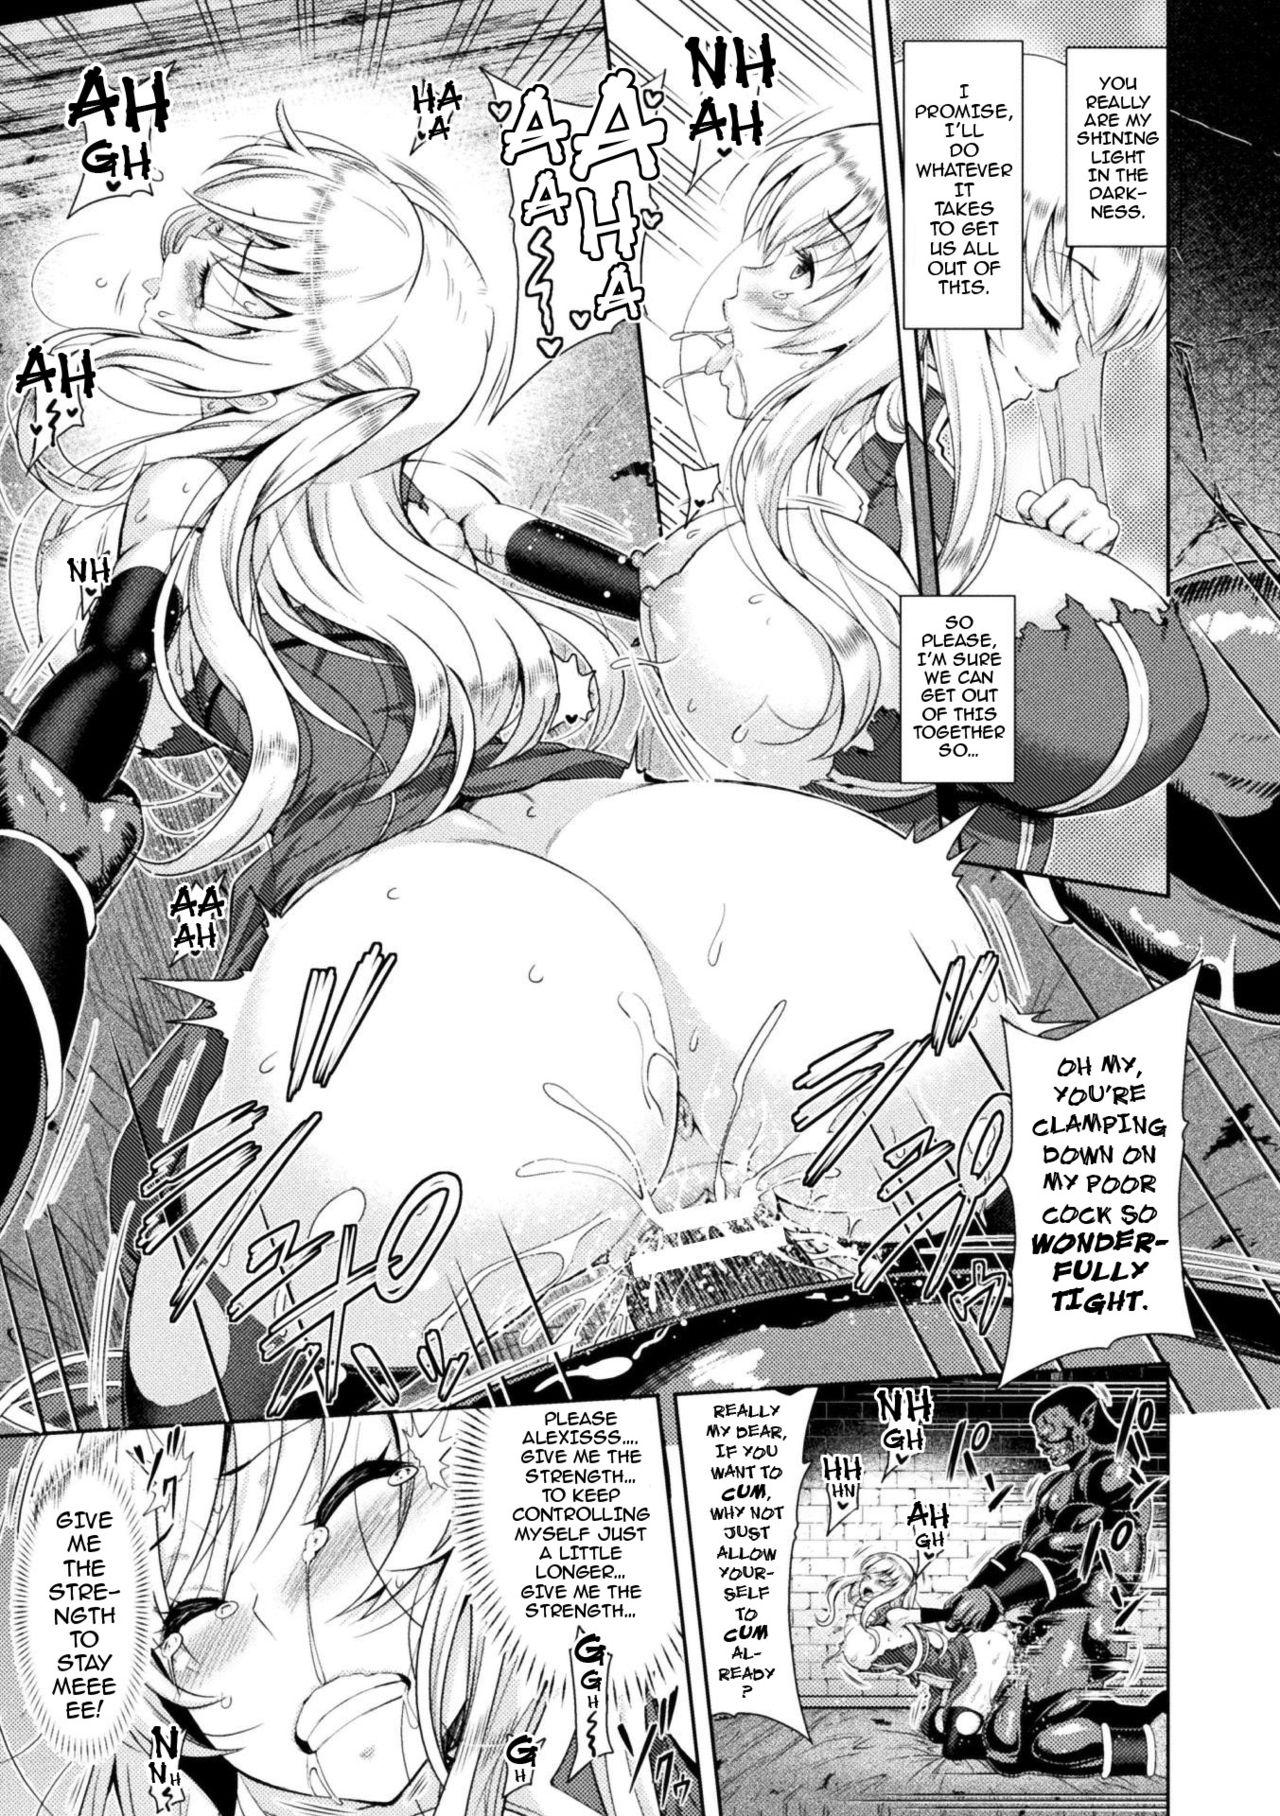 [Yamada Gogogo] Erona ~Orc no Inmon ni Okasareta Onna Kishi no Matsuro~ | Erona ~The Fall of a Beautiful Knight Cursed with the Lewd Mark of an Orc~ [English] {darknight} 35